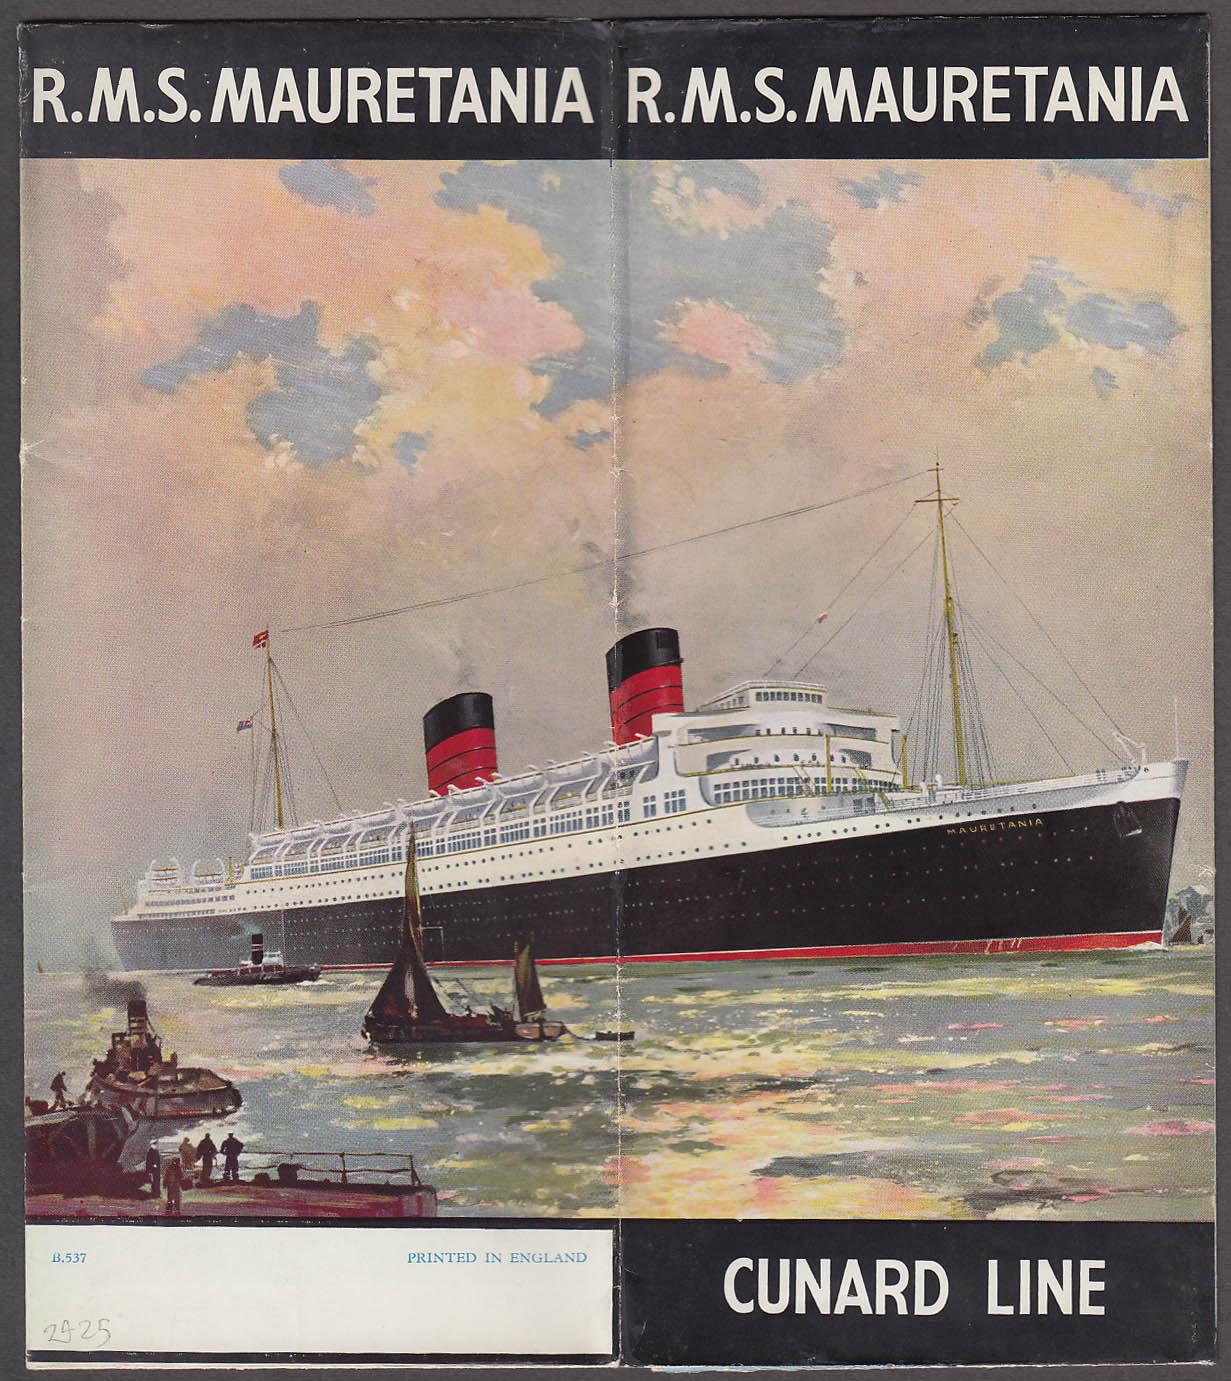 Cunard Line R M S Mauretania ocean liner folder 1930s